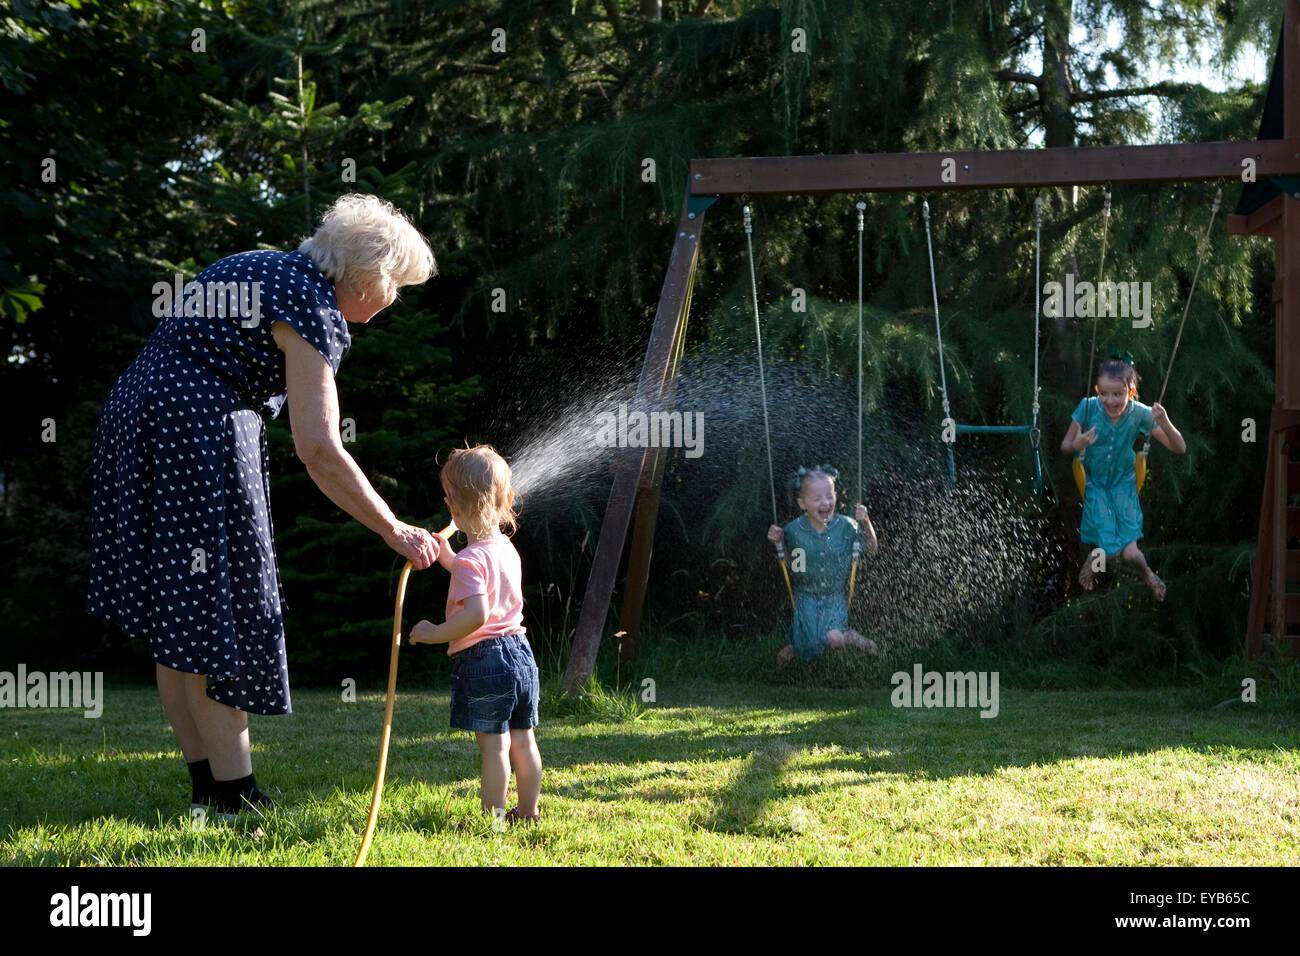 Family playing in garden avec le tuyau d'eau en été. Photo Stock